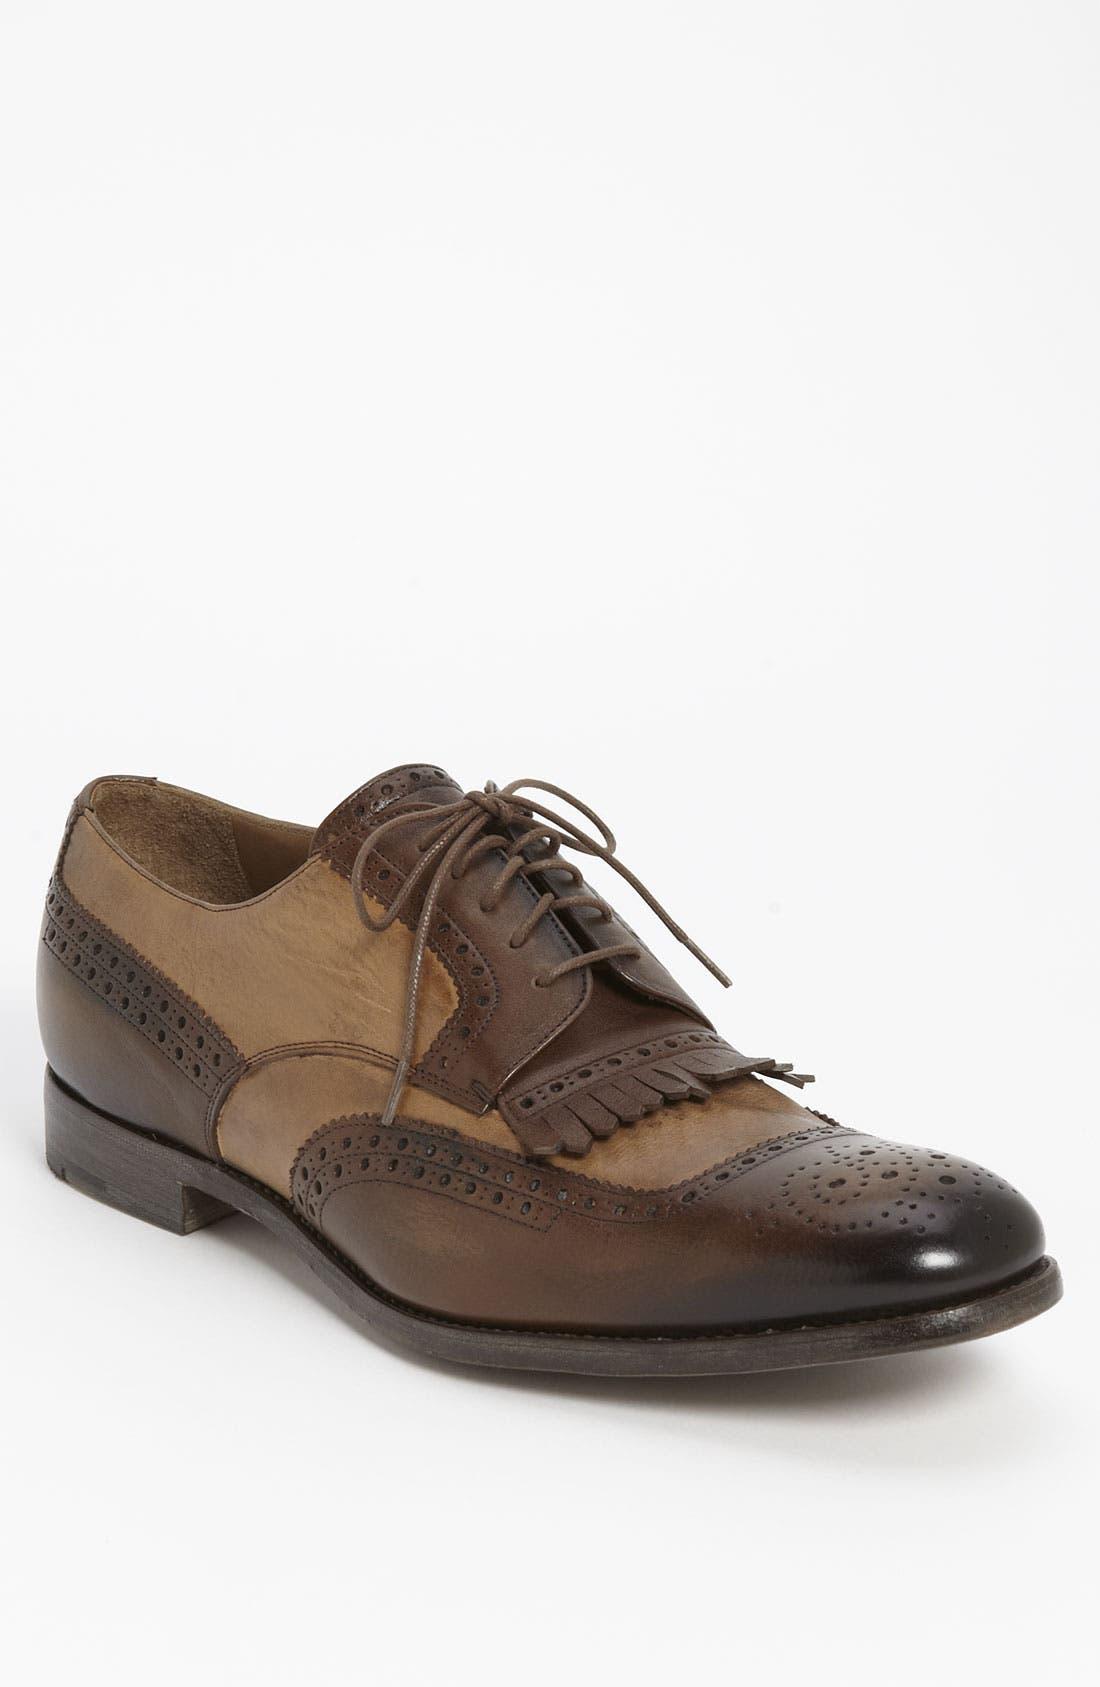 Main Image - Prada Kiltie Spectator Shoe